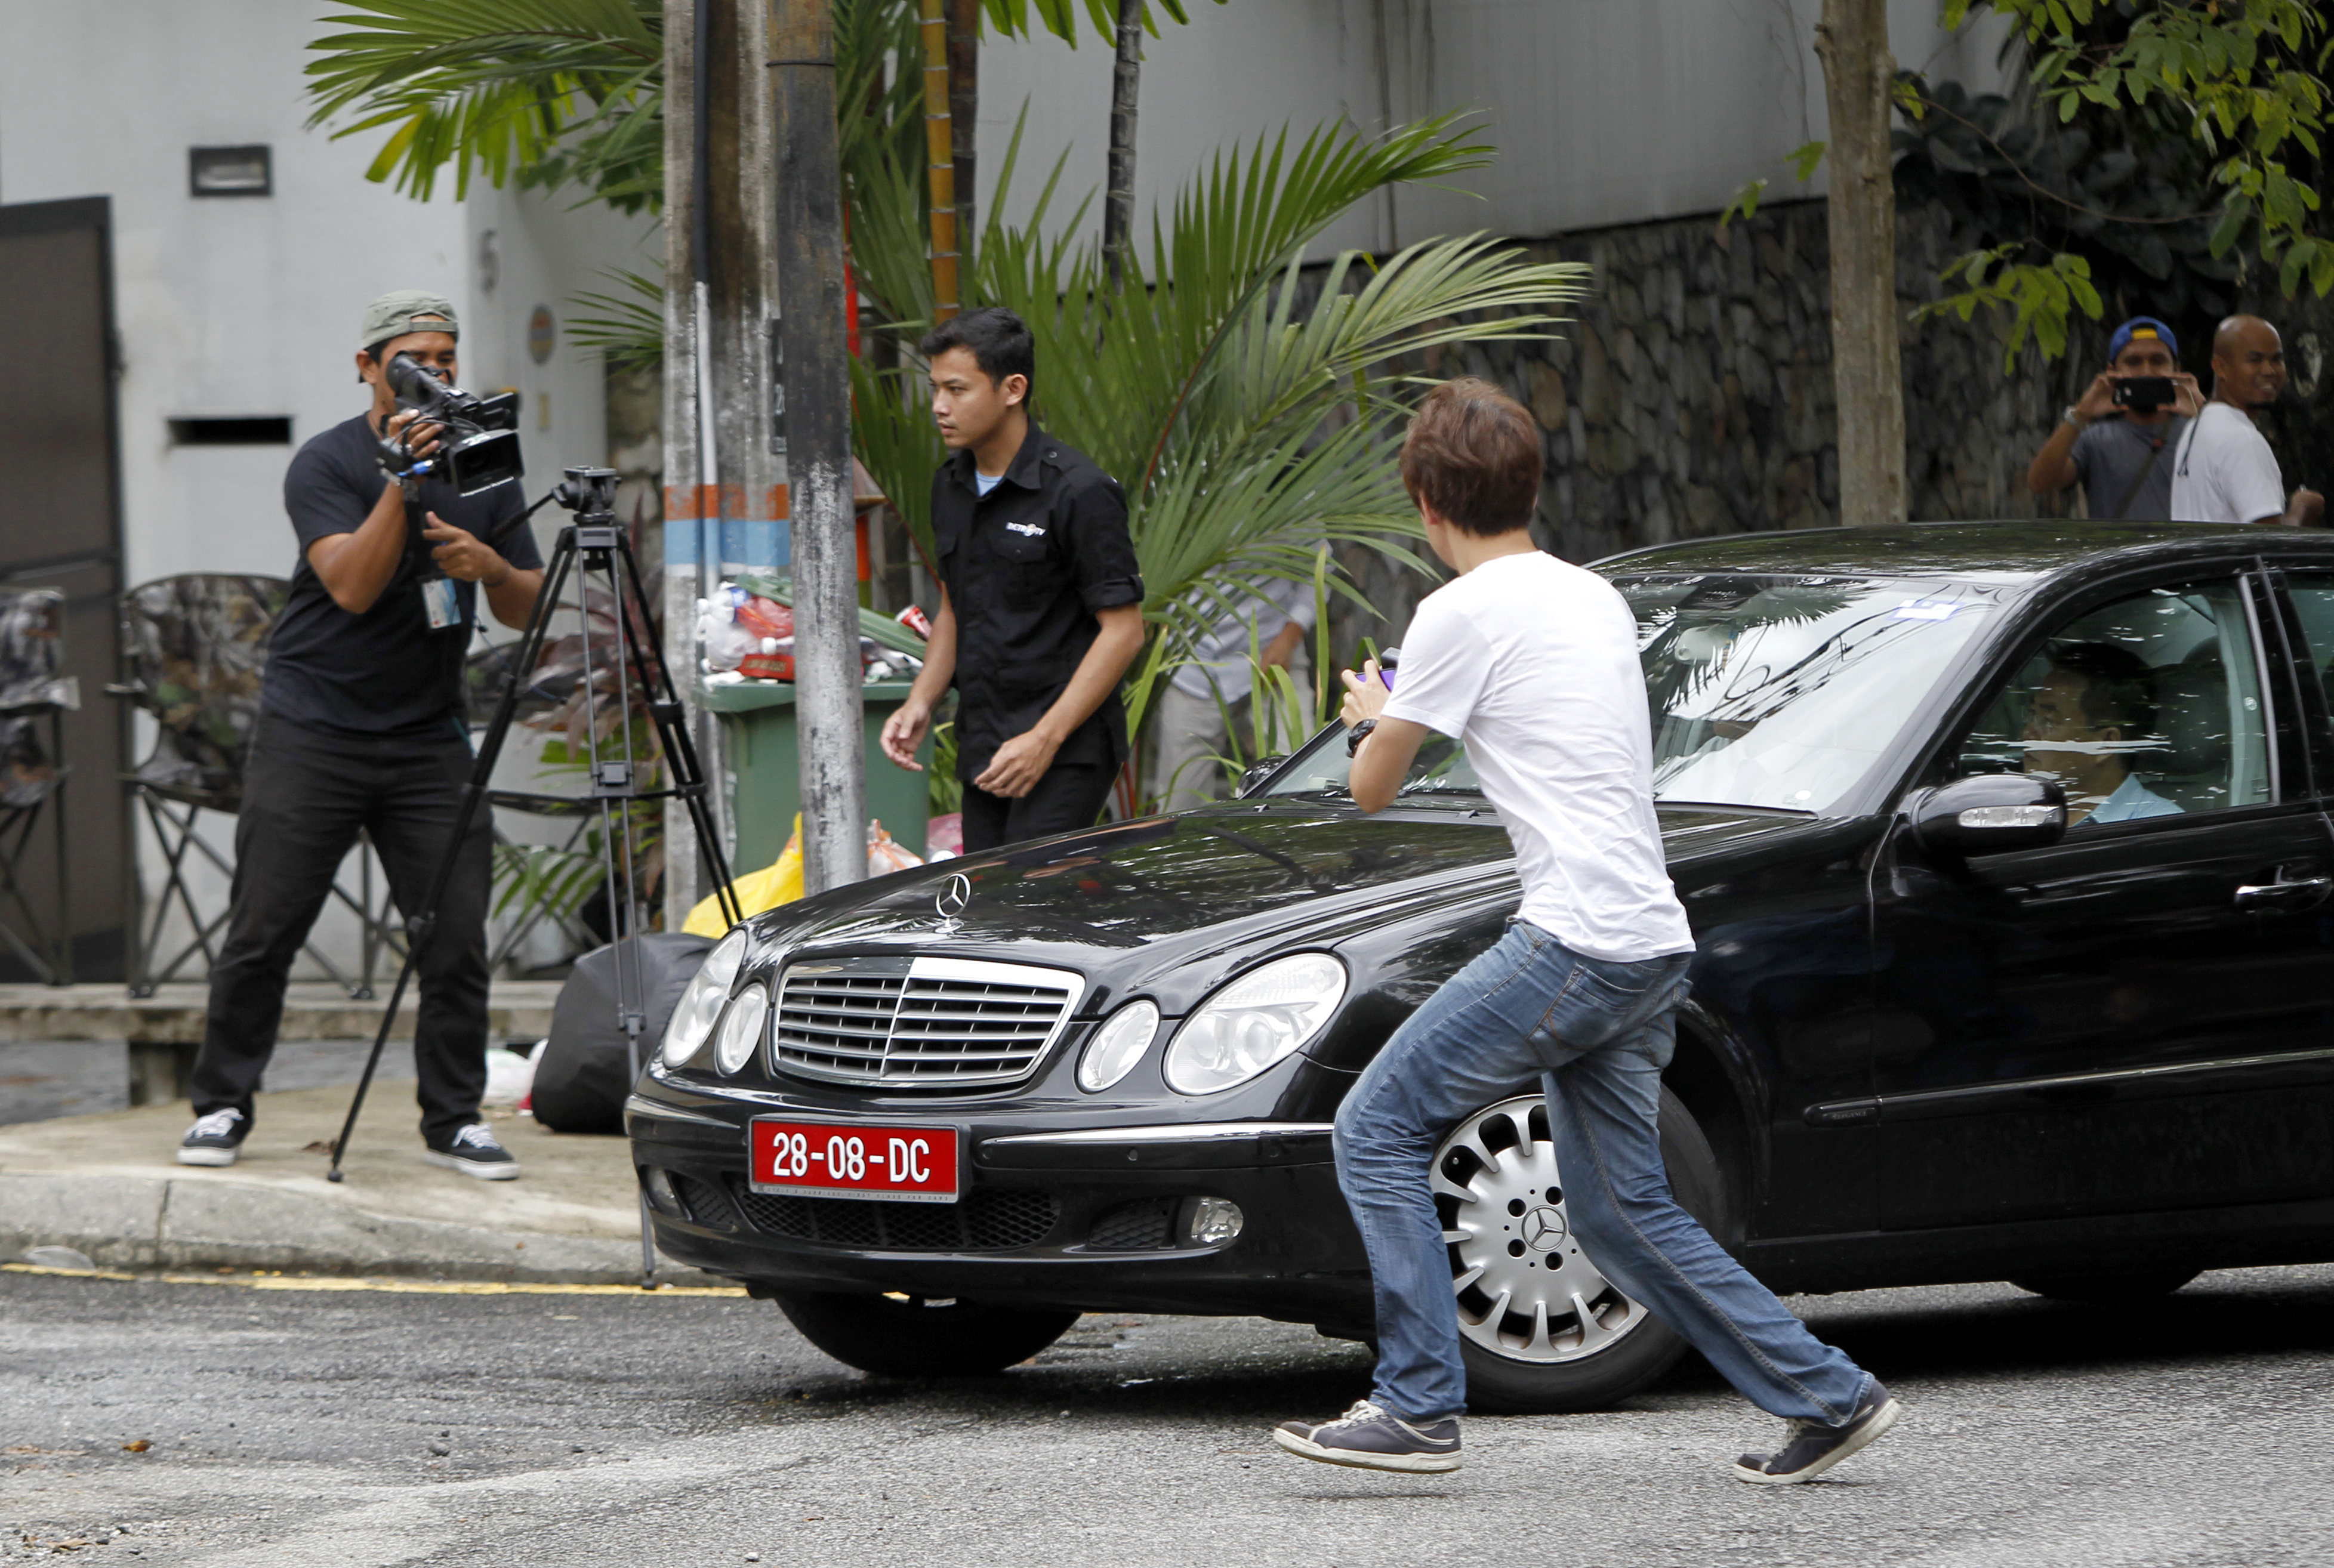 Journalists chase a car leaving North Korean Embassy in Kuala Lumpur, Malaysia on Feb. 27, 2017. (AP Photo/Daniel Chan)